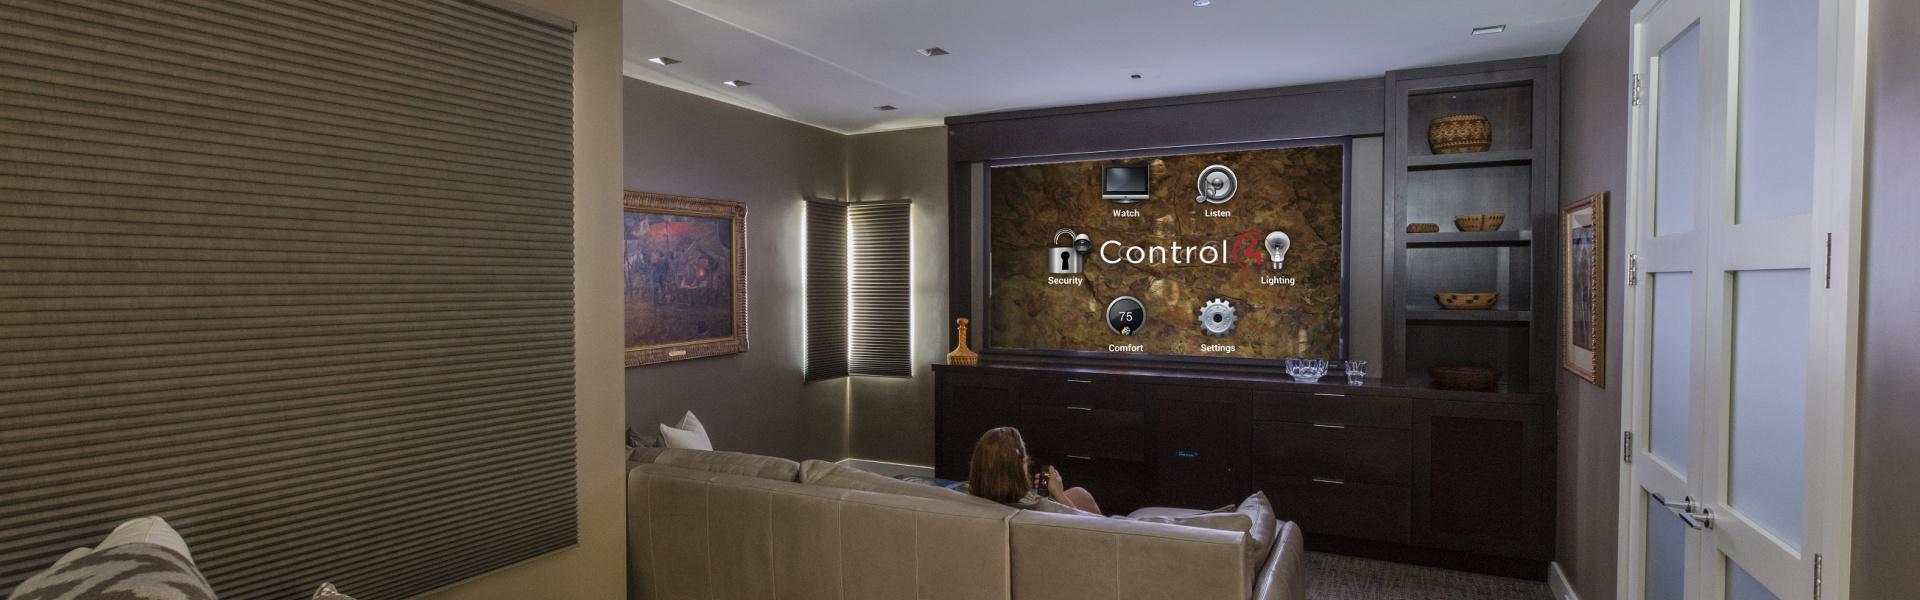 Smart home installation by Technology Design Associates for Salem